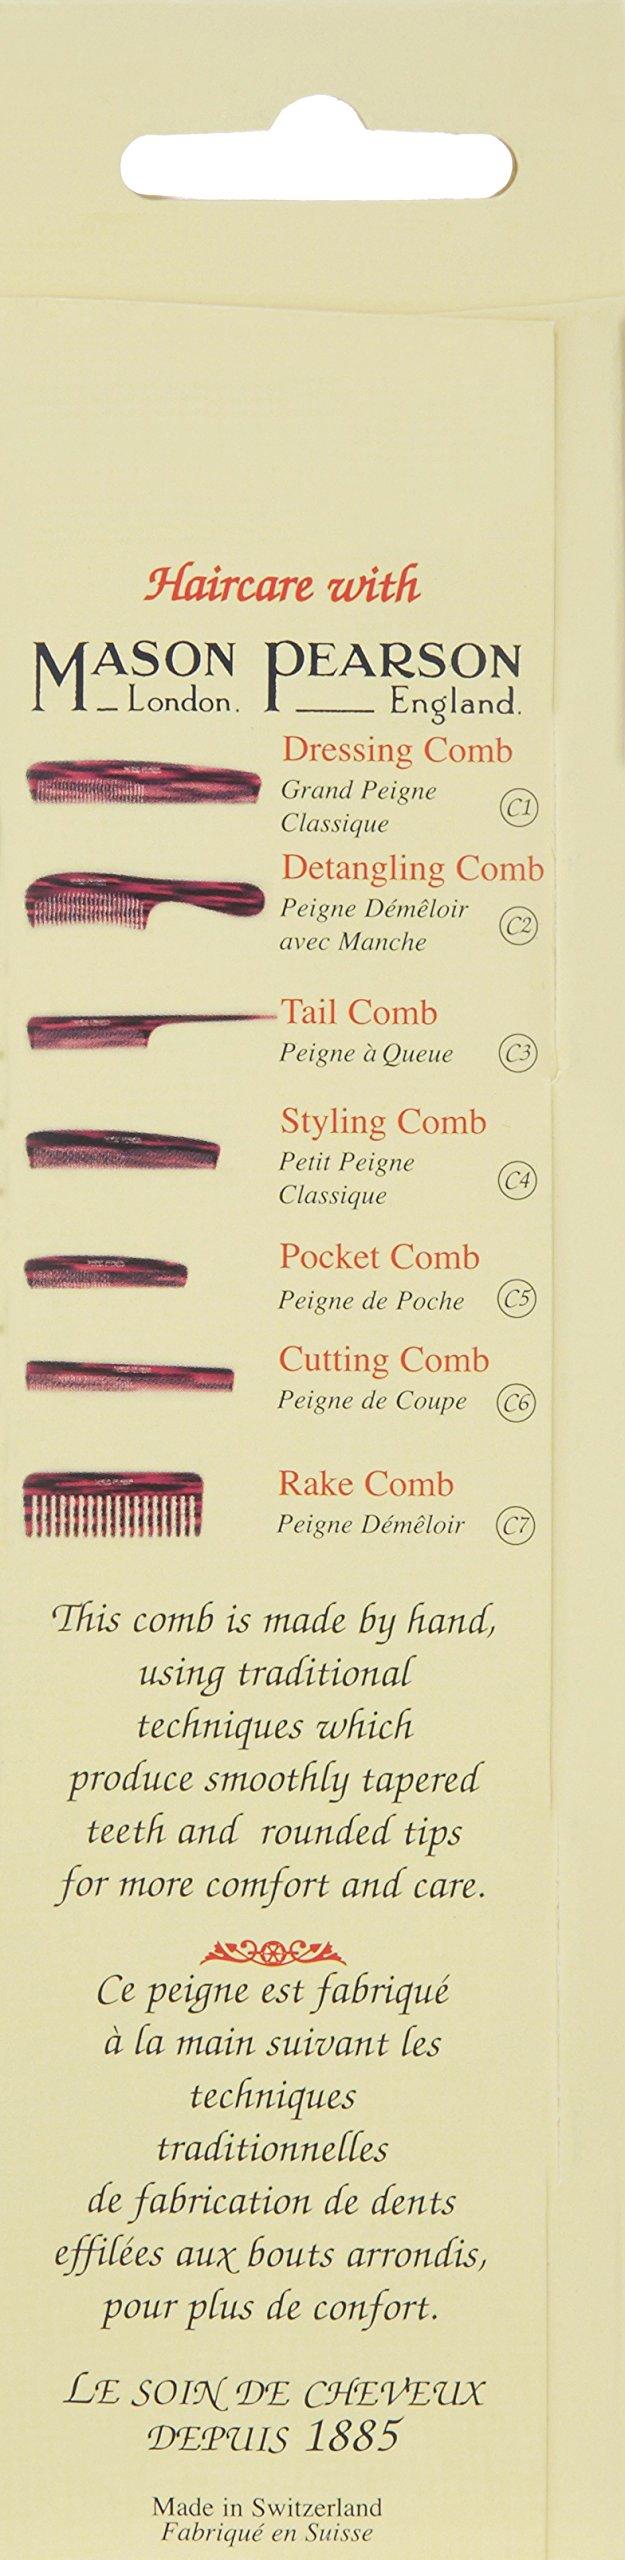 Mason Pearson Detangling Comb by Mason Pearson